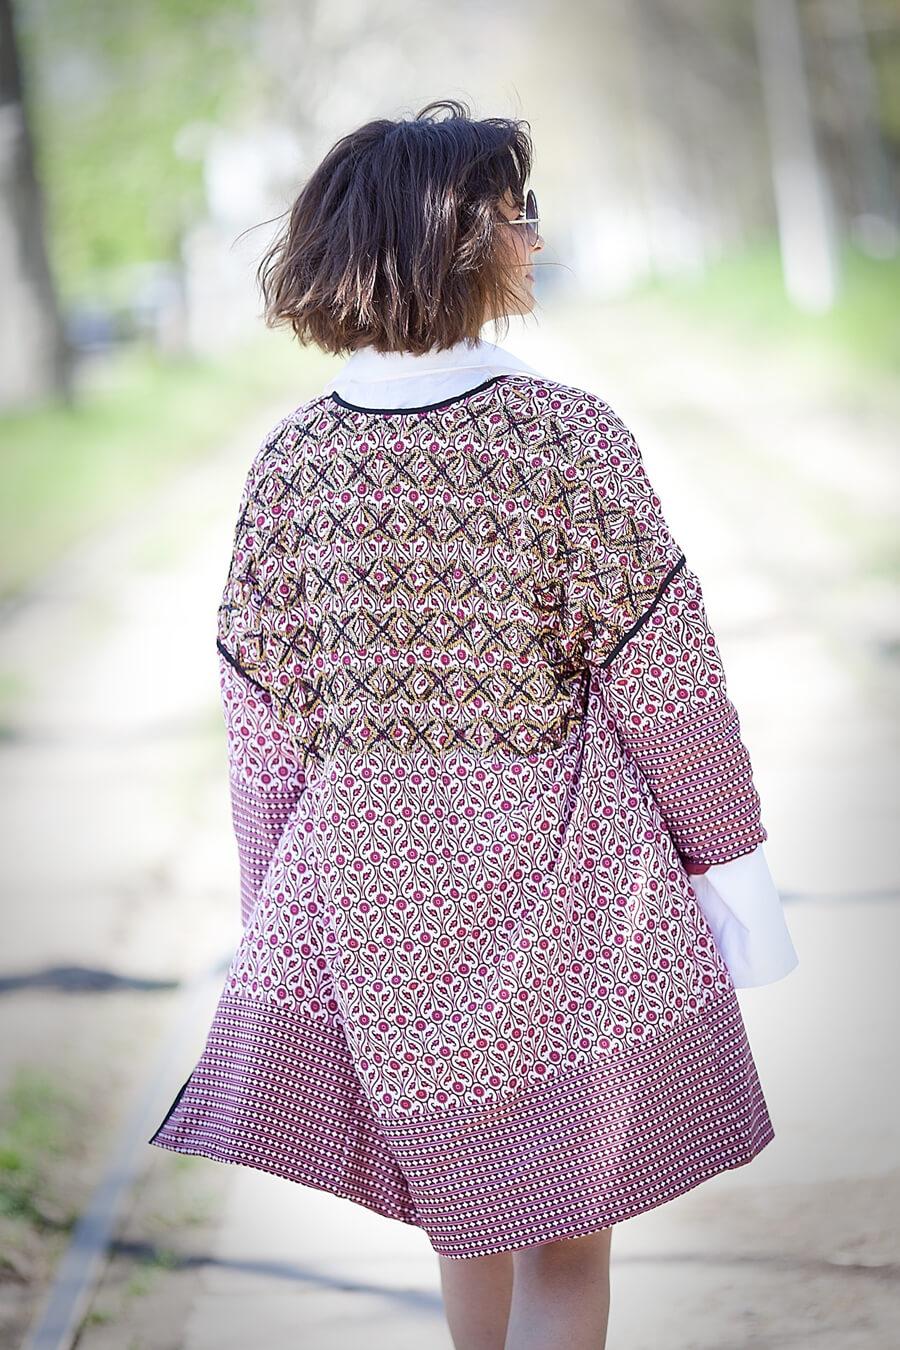 asos-embellished-jacket-outfit